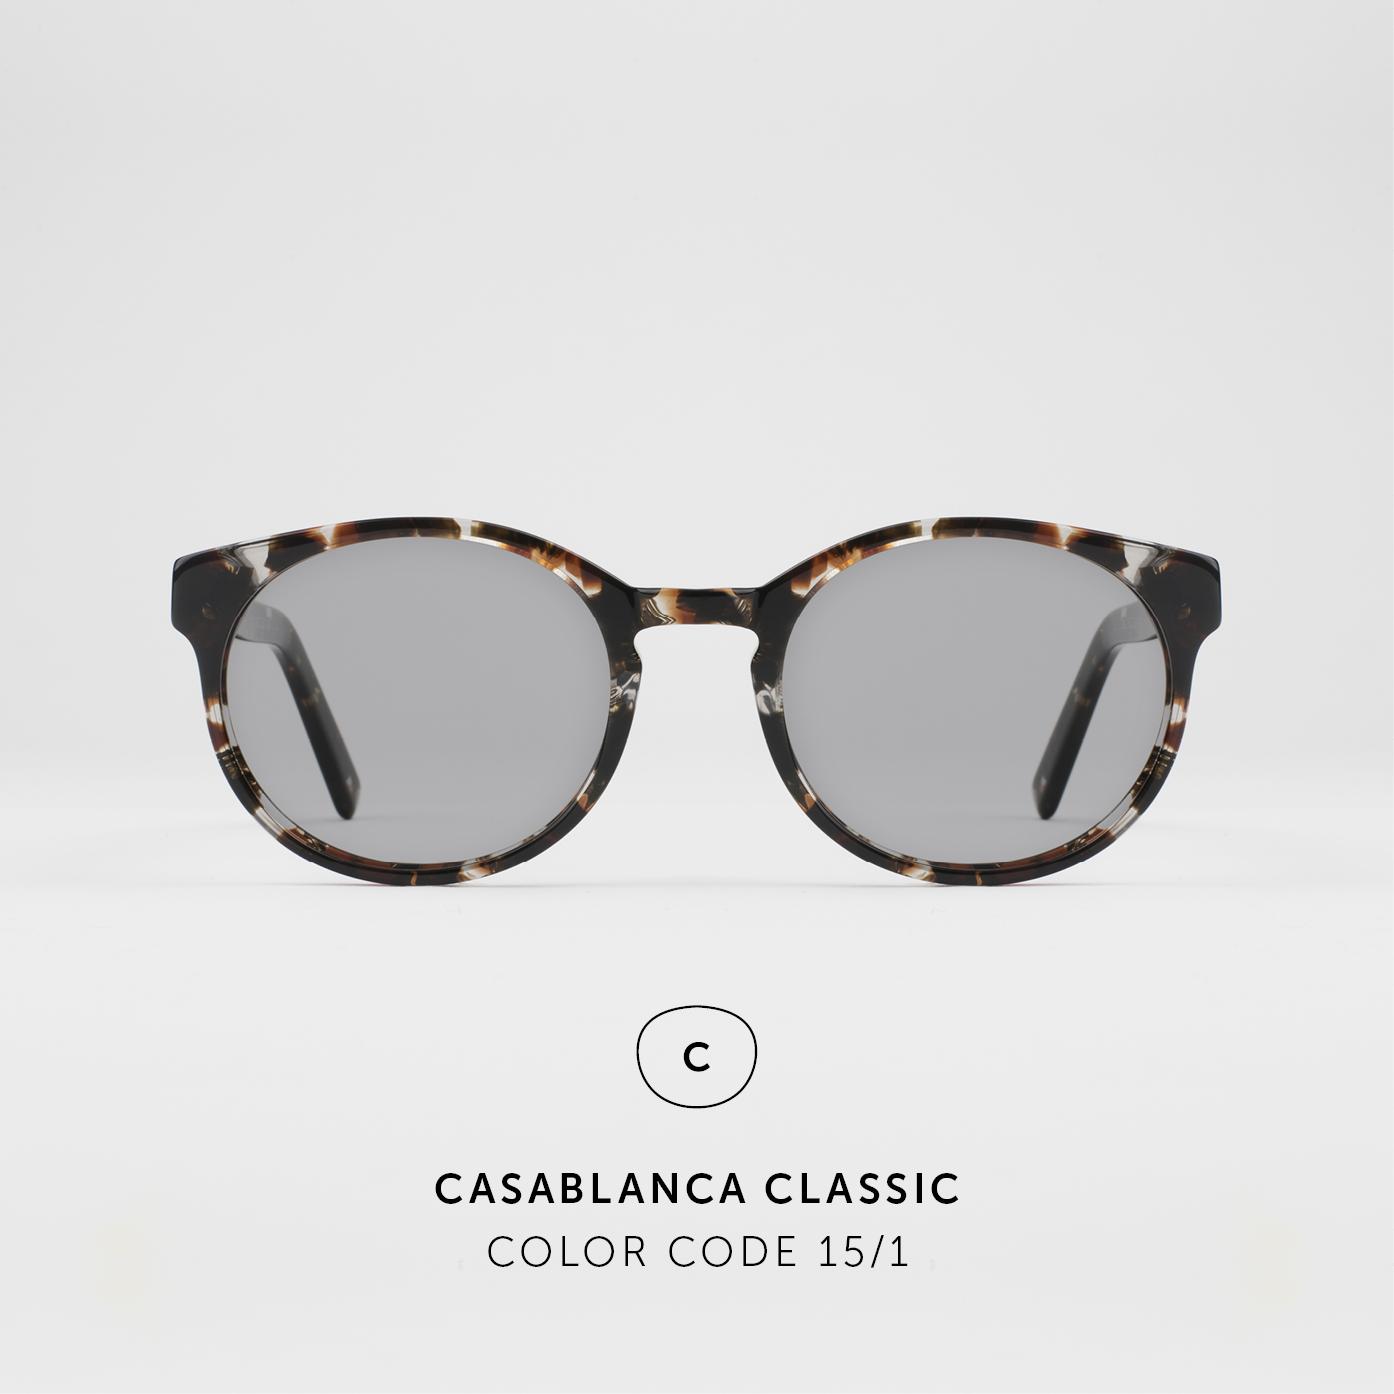 CasablancaClassic40.jpg